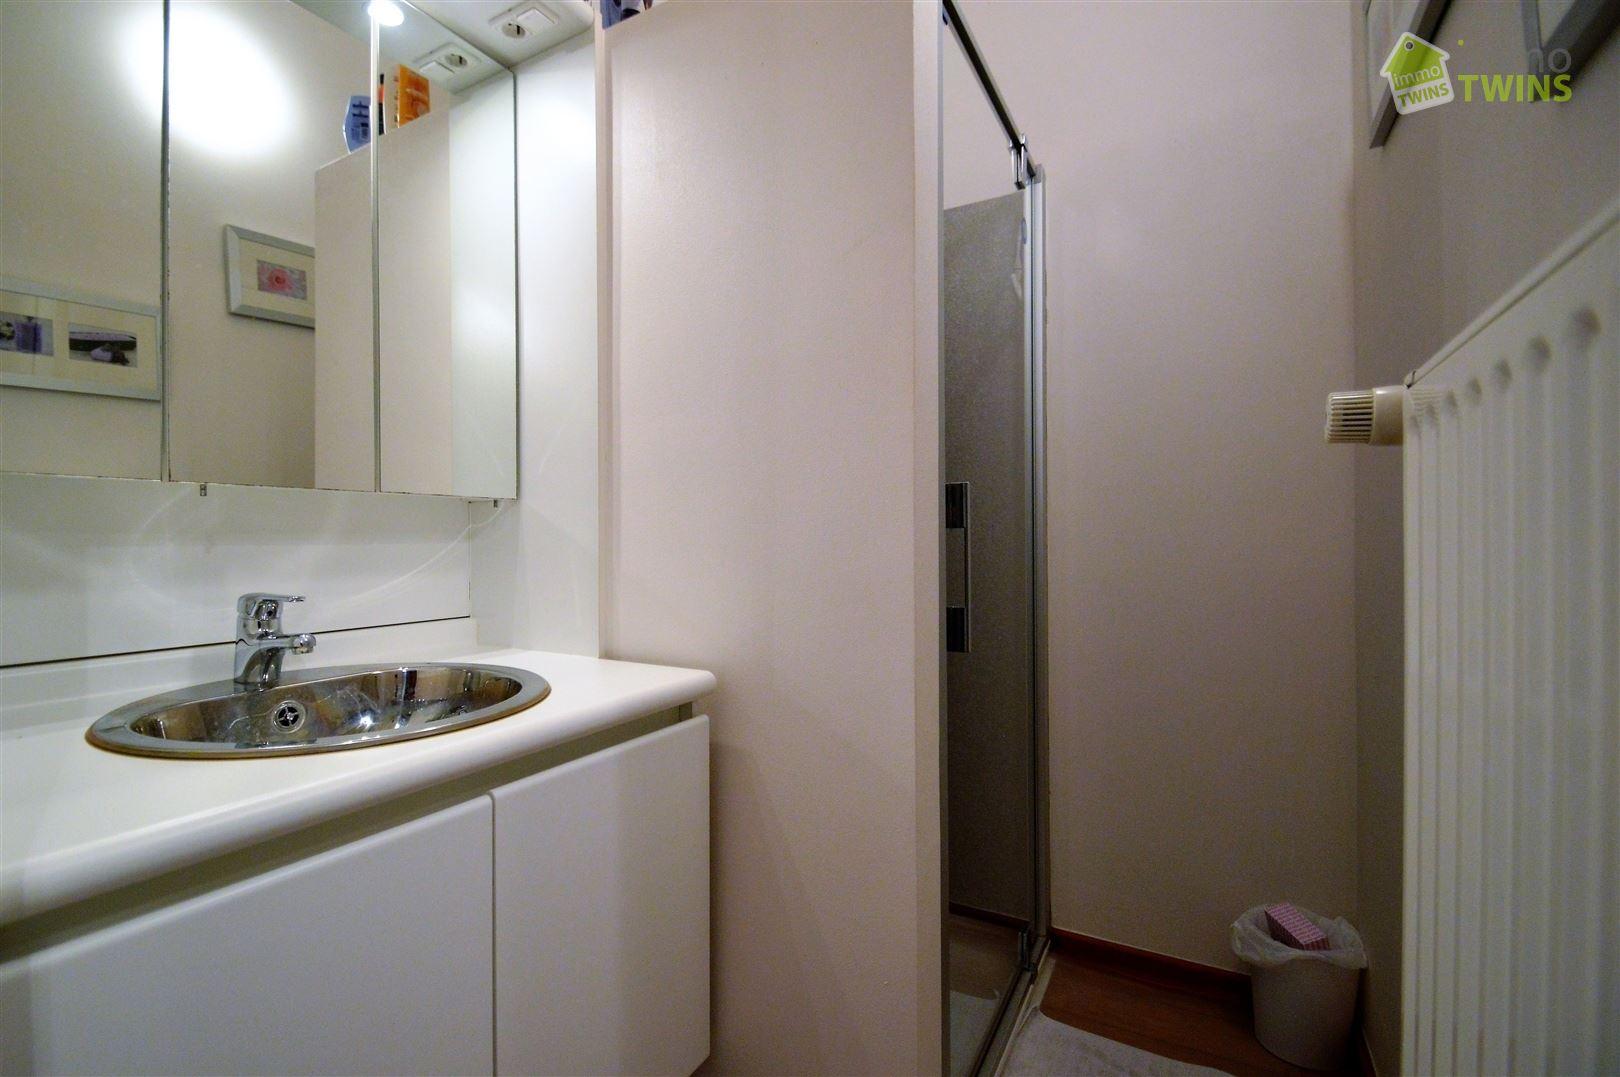 Foto 14 : Duplex/Penthouse te 2890 SINT-AMANDS (België) - Prijs € 449.000